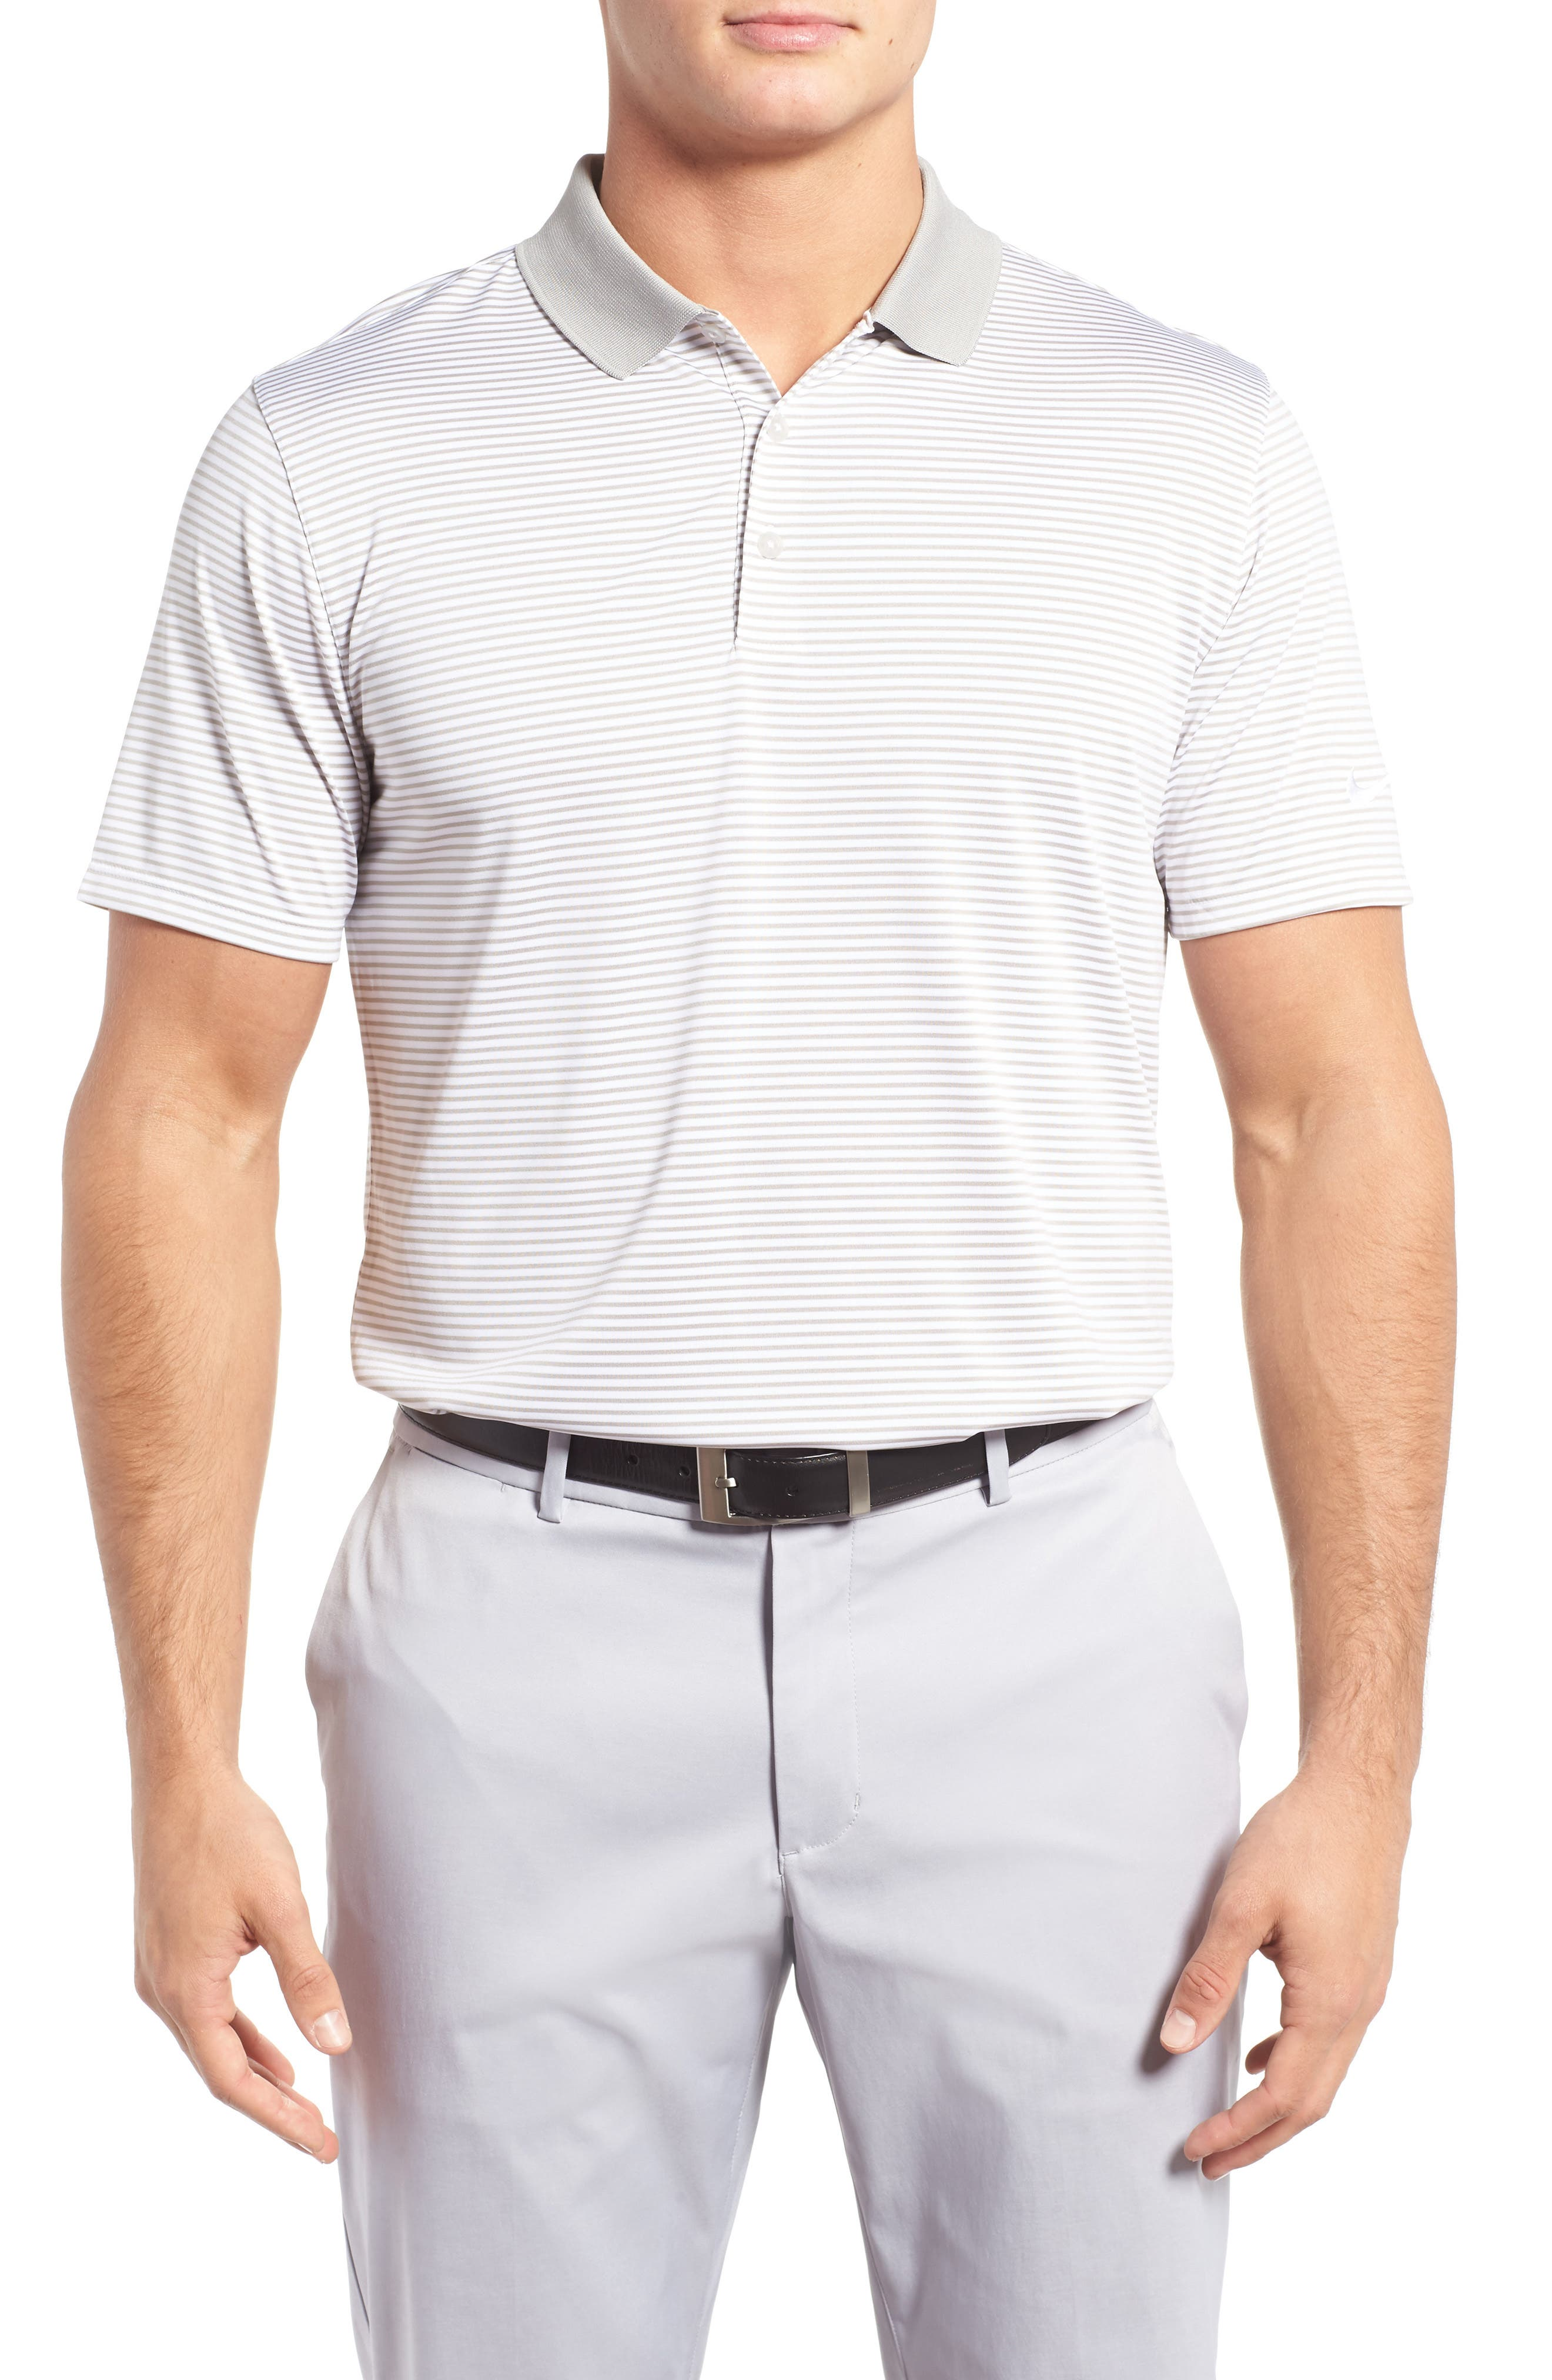 NIKE 'Victory Stripe' Dri-FIT Golf Polo